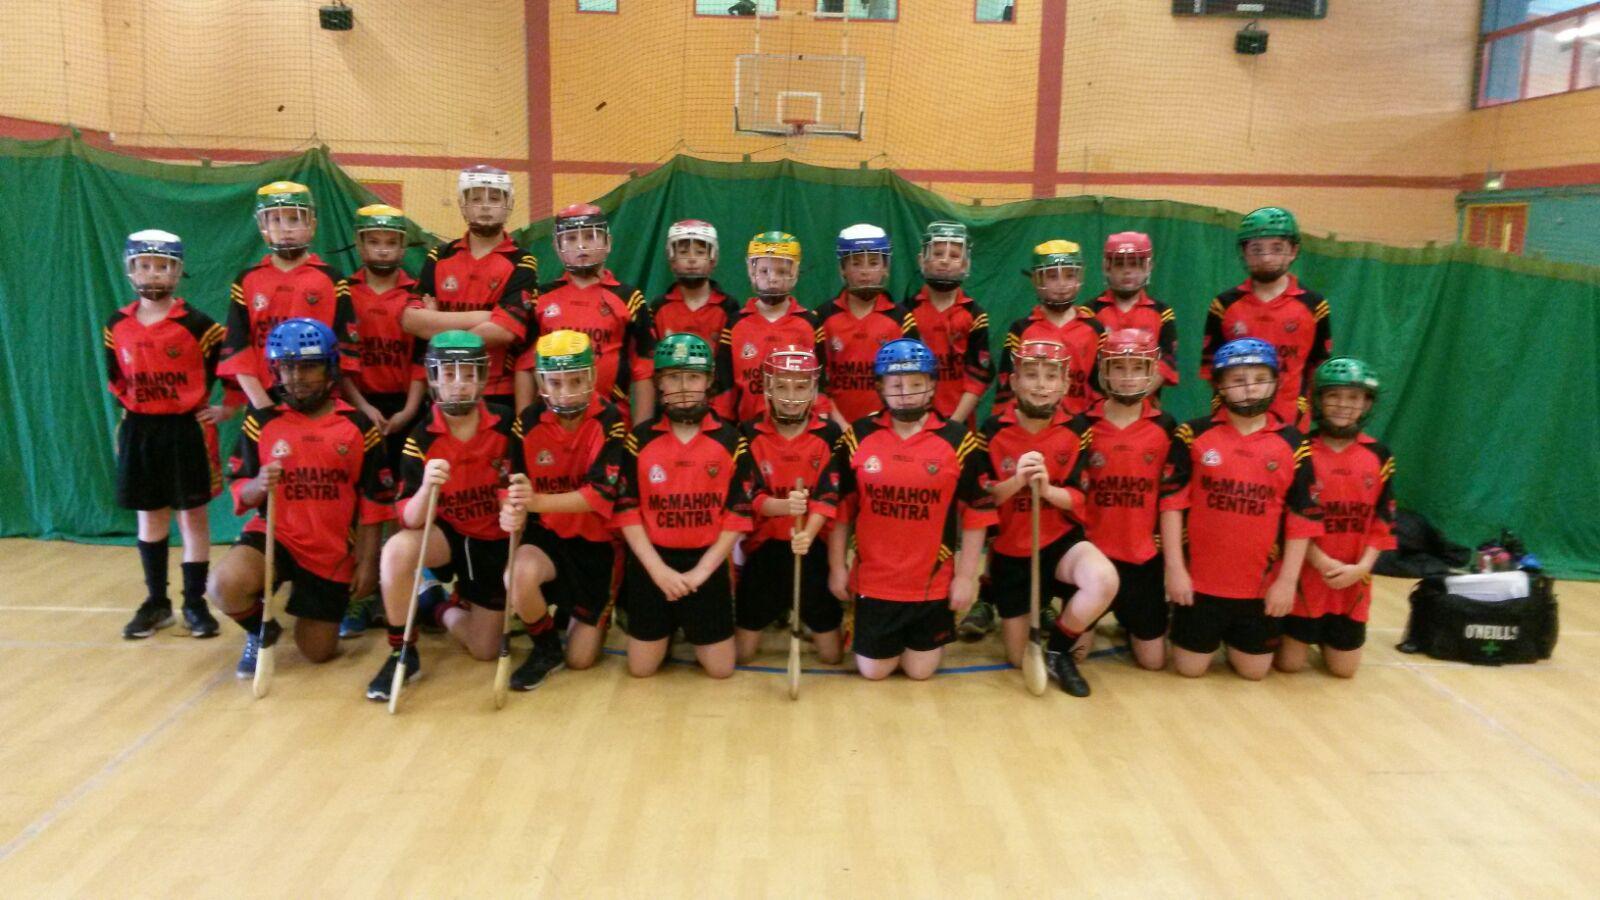 Primary School Indoor Hurling League a great success